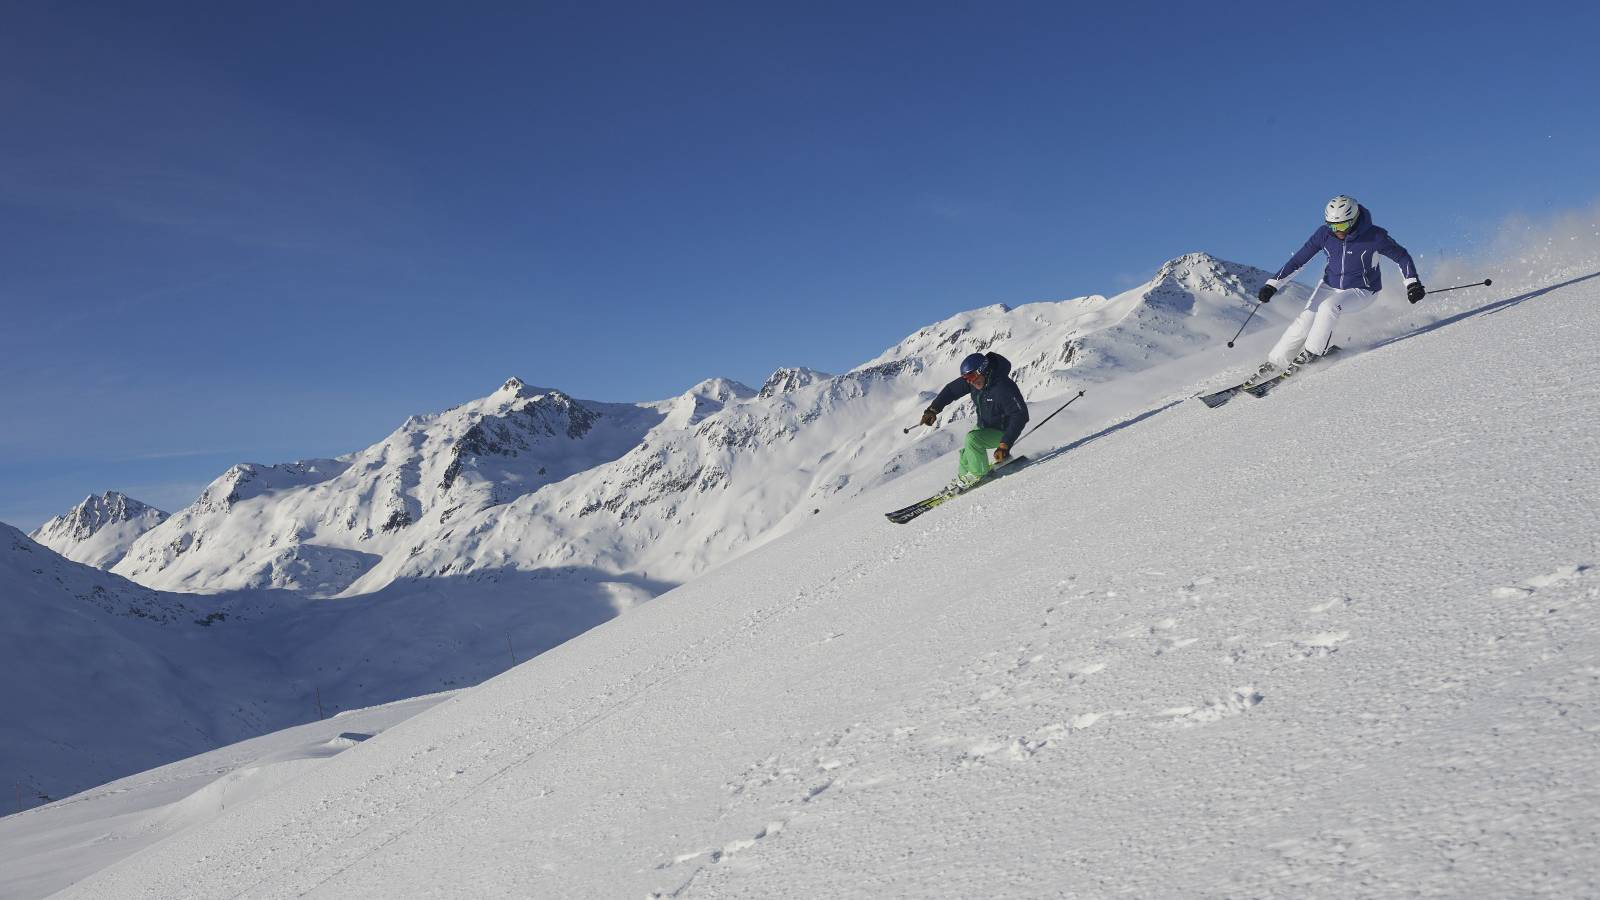 Neues Skigebiet Andermatt-Sedrun ist auf Kurs